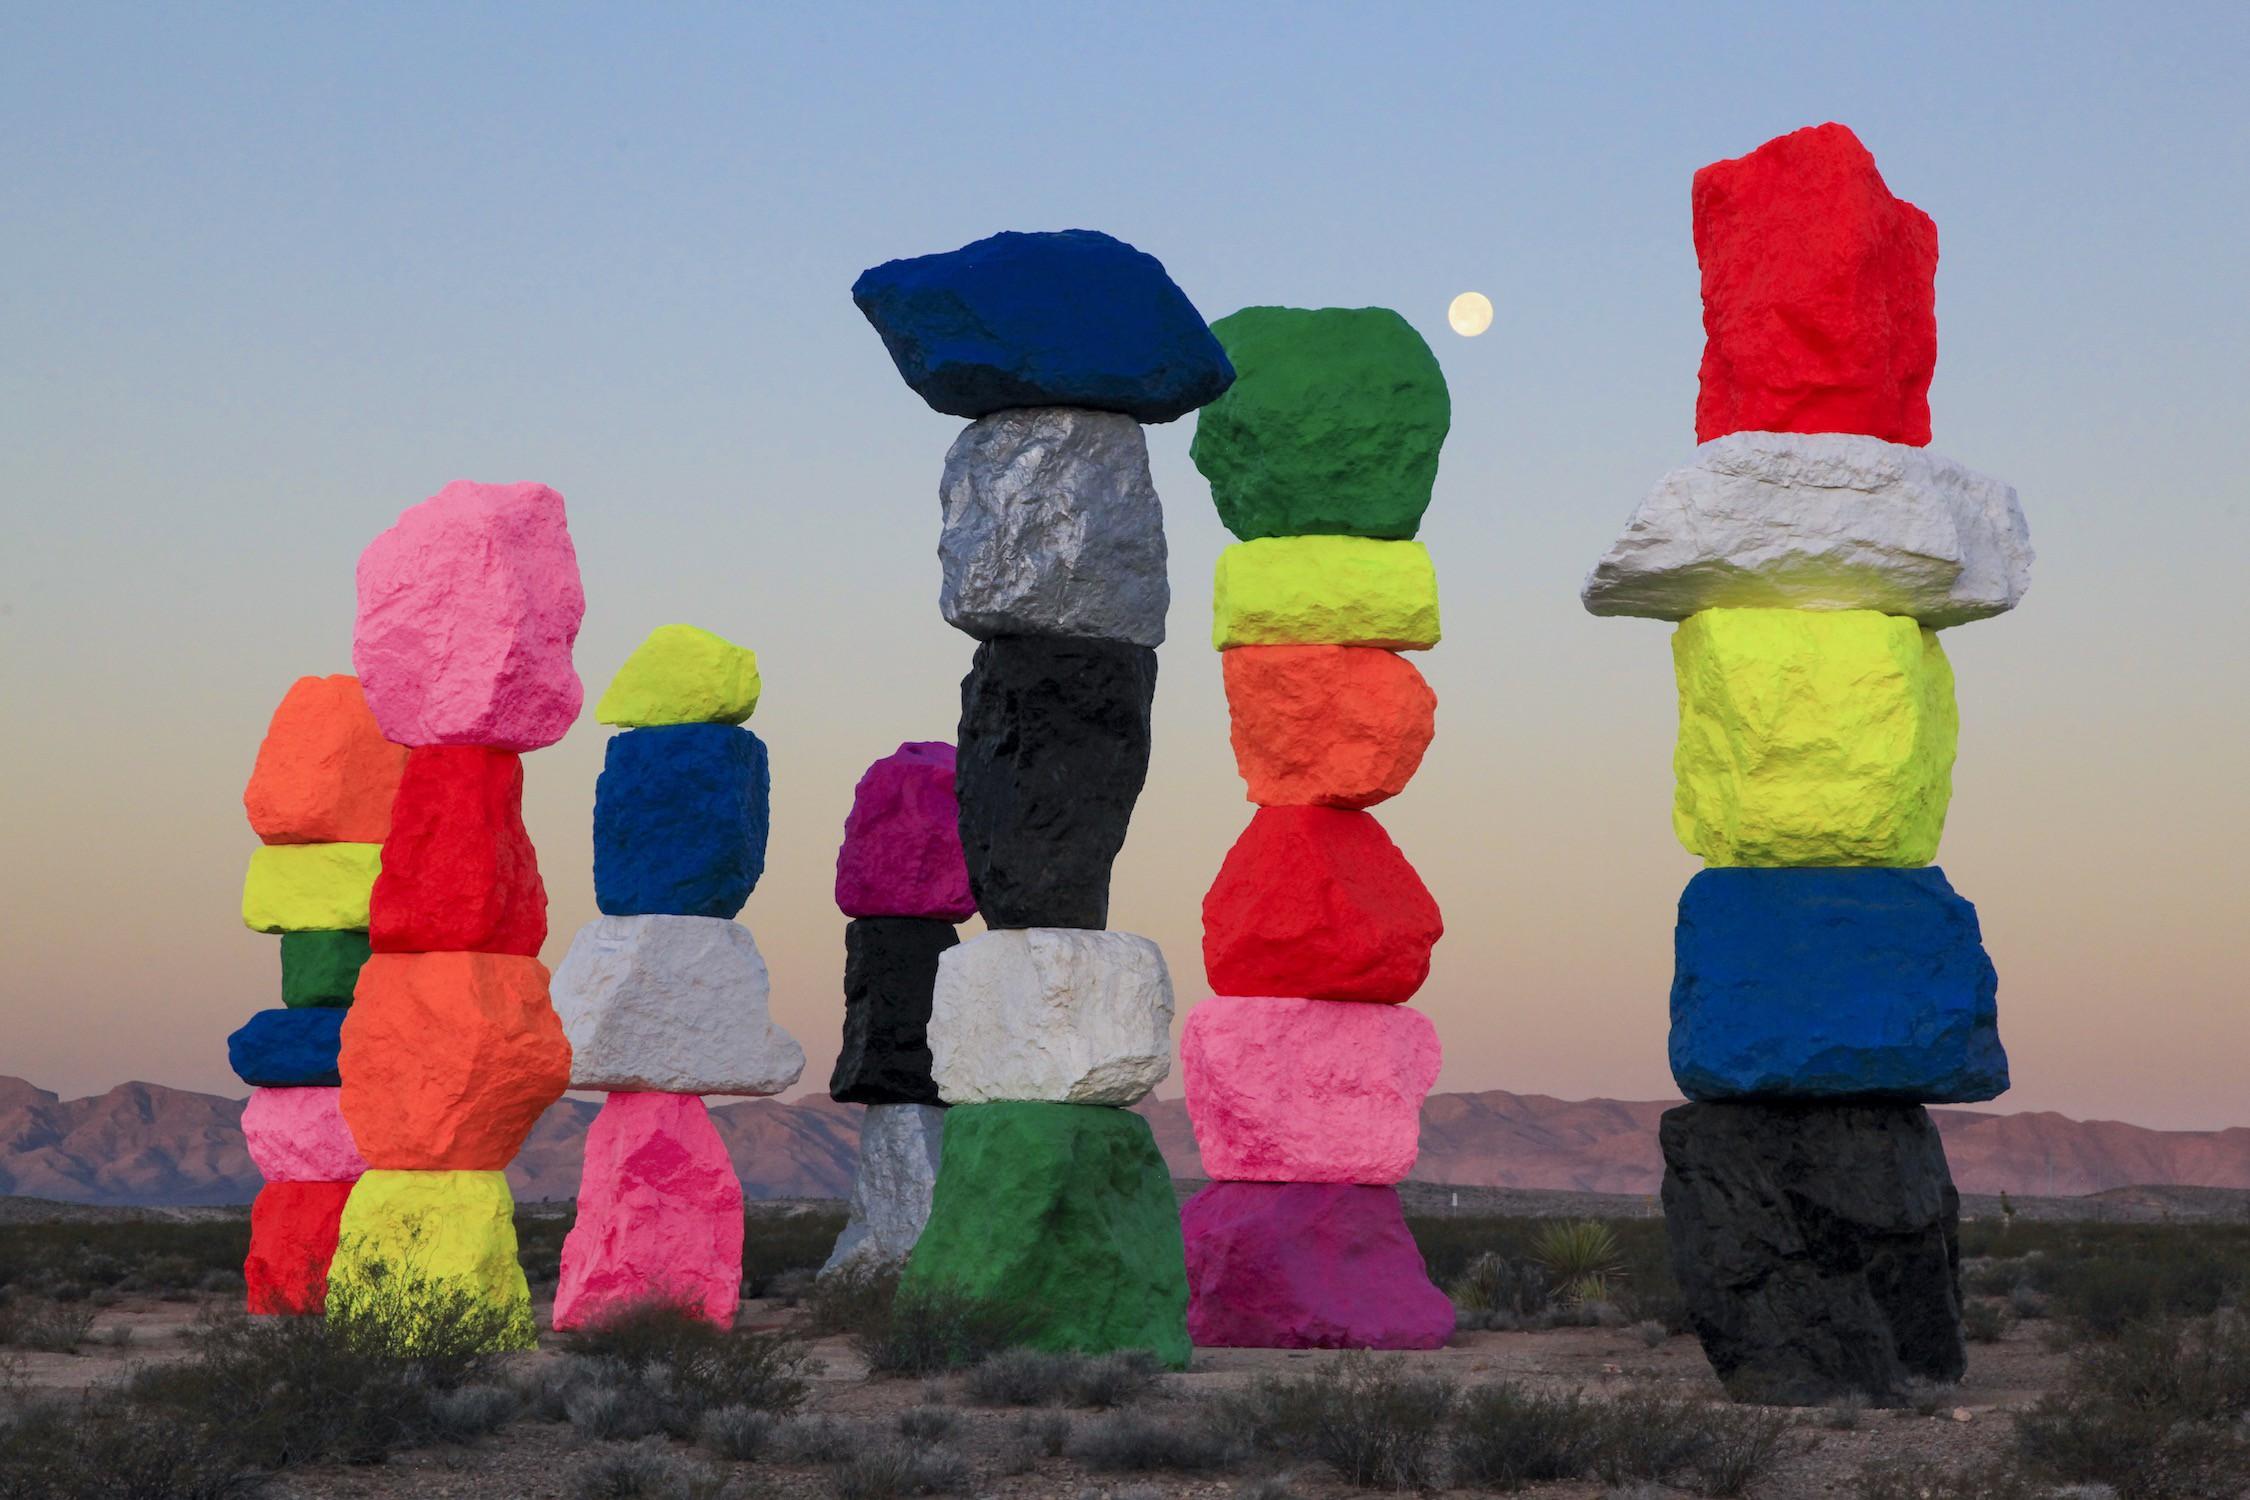 Ugo Rondinone, Seven Magic Mountains, Las Vegas, Nevada, 2016. Photo by Gianfranco Gorgoni. Courtesy of Art Production Fund and Nevada Museum of Art.